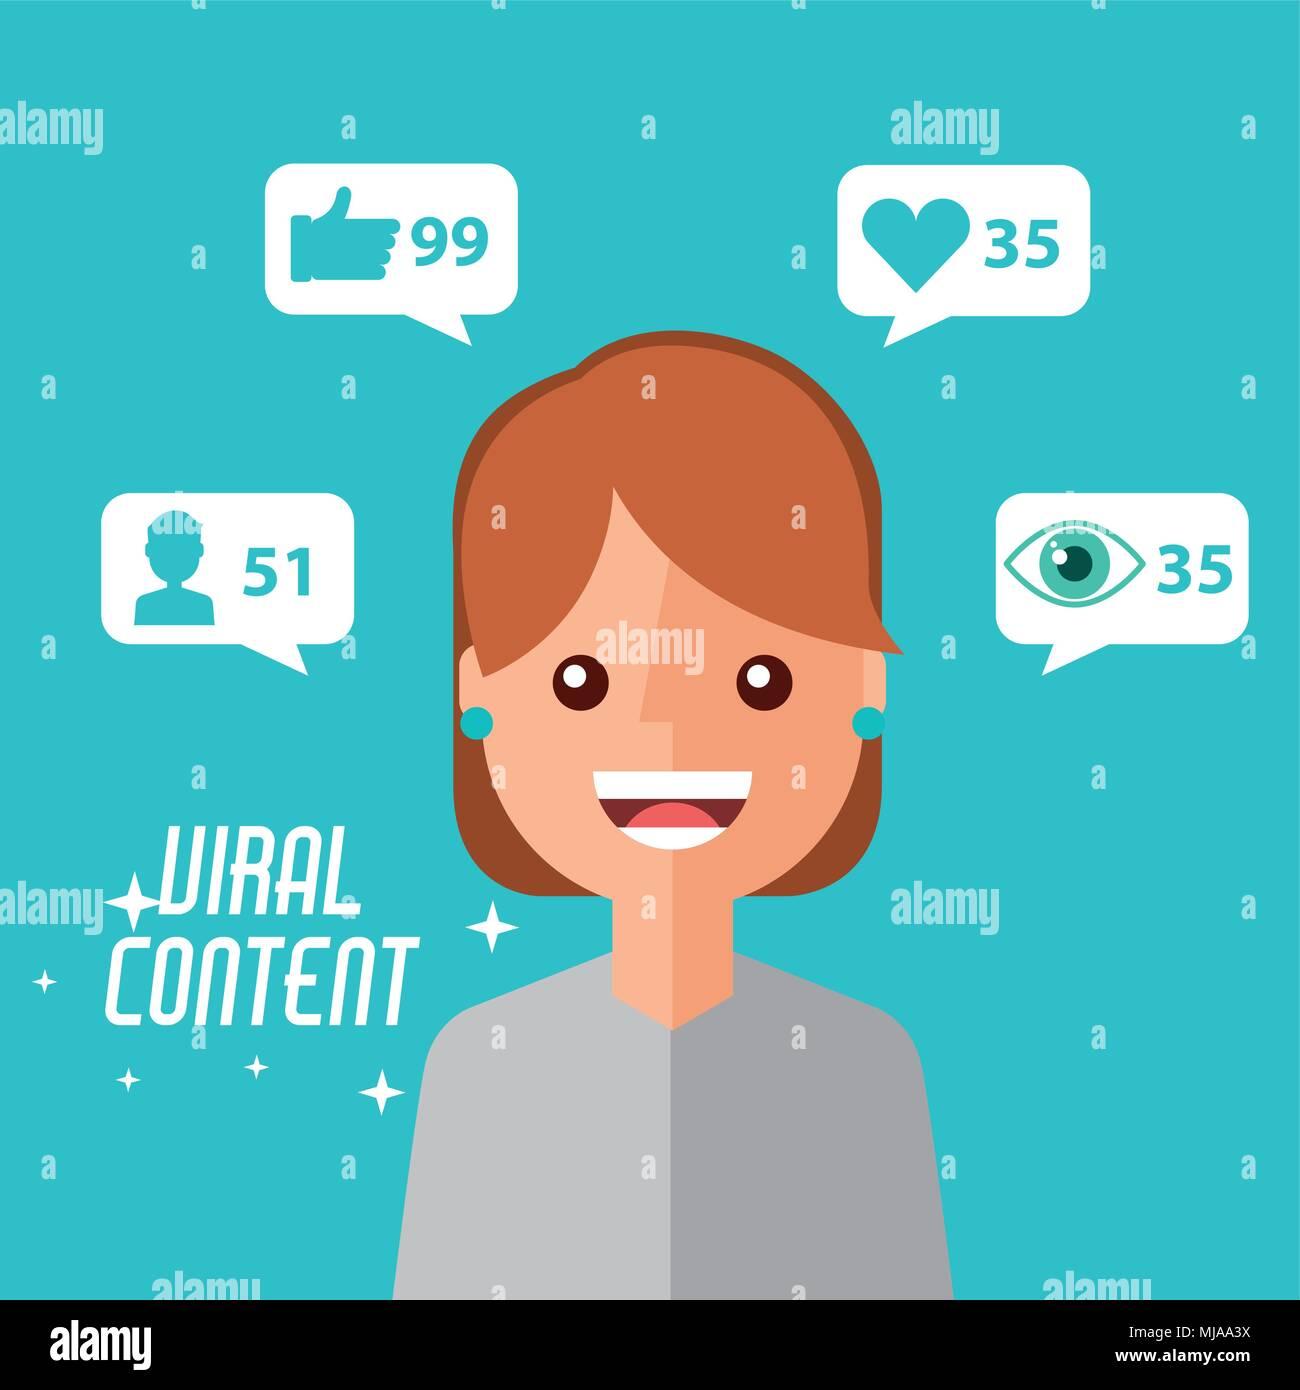 Retrato mujer cartoon contenido viral Imagen De Stock